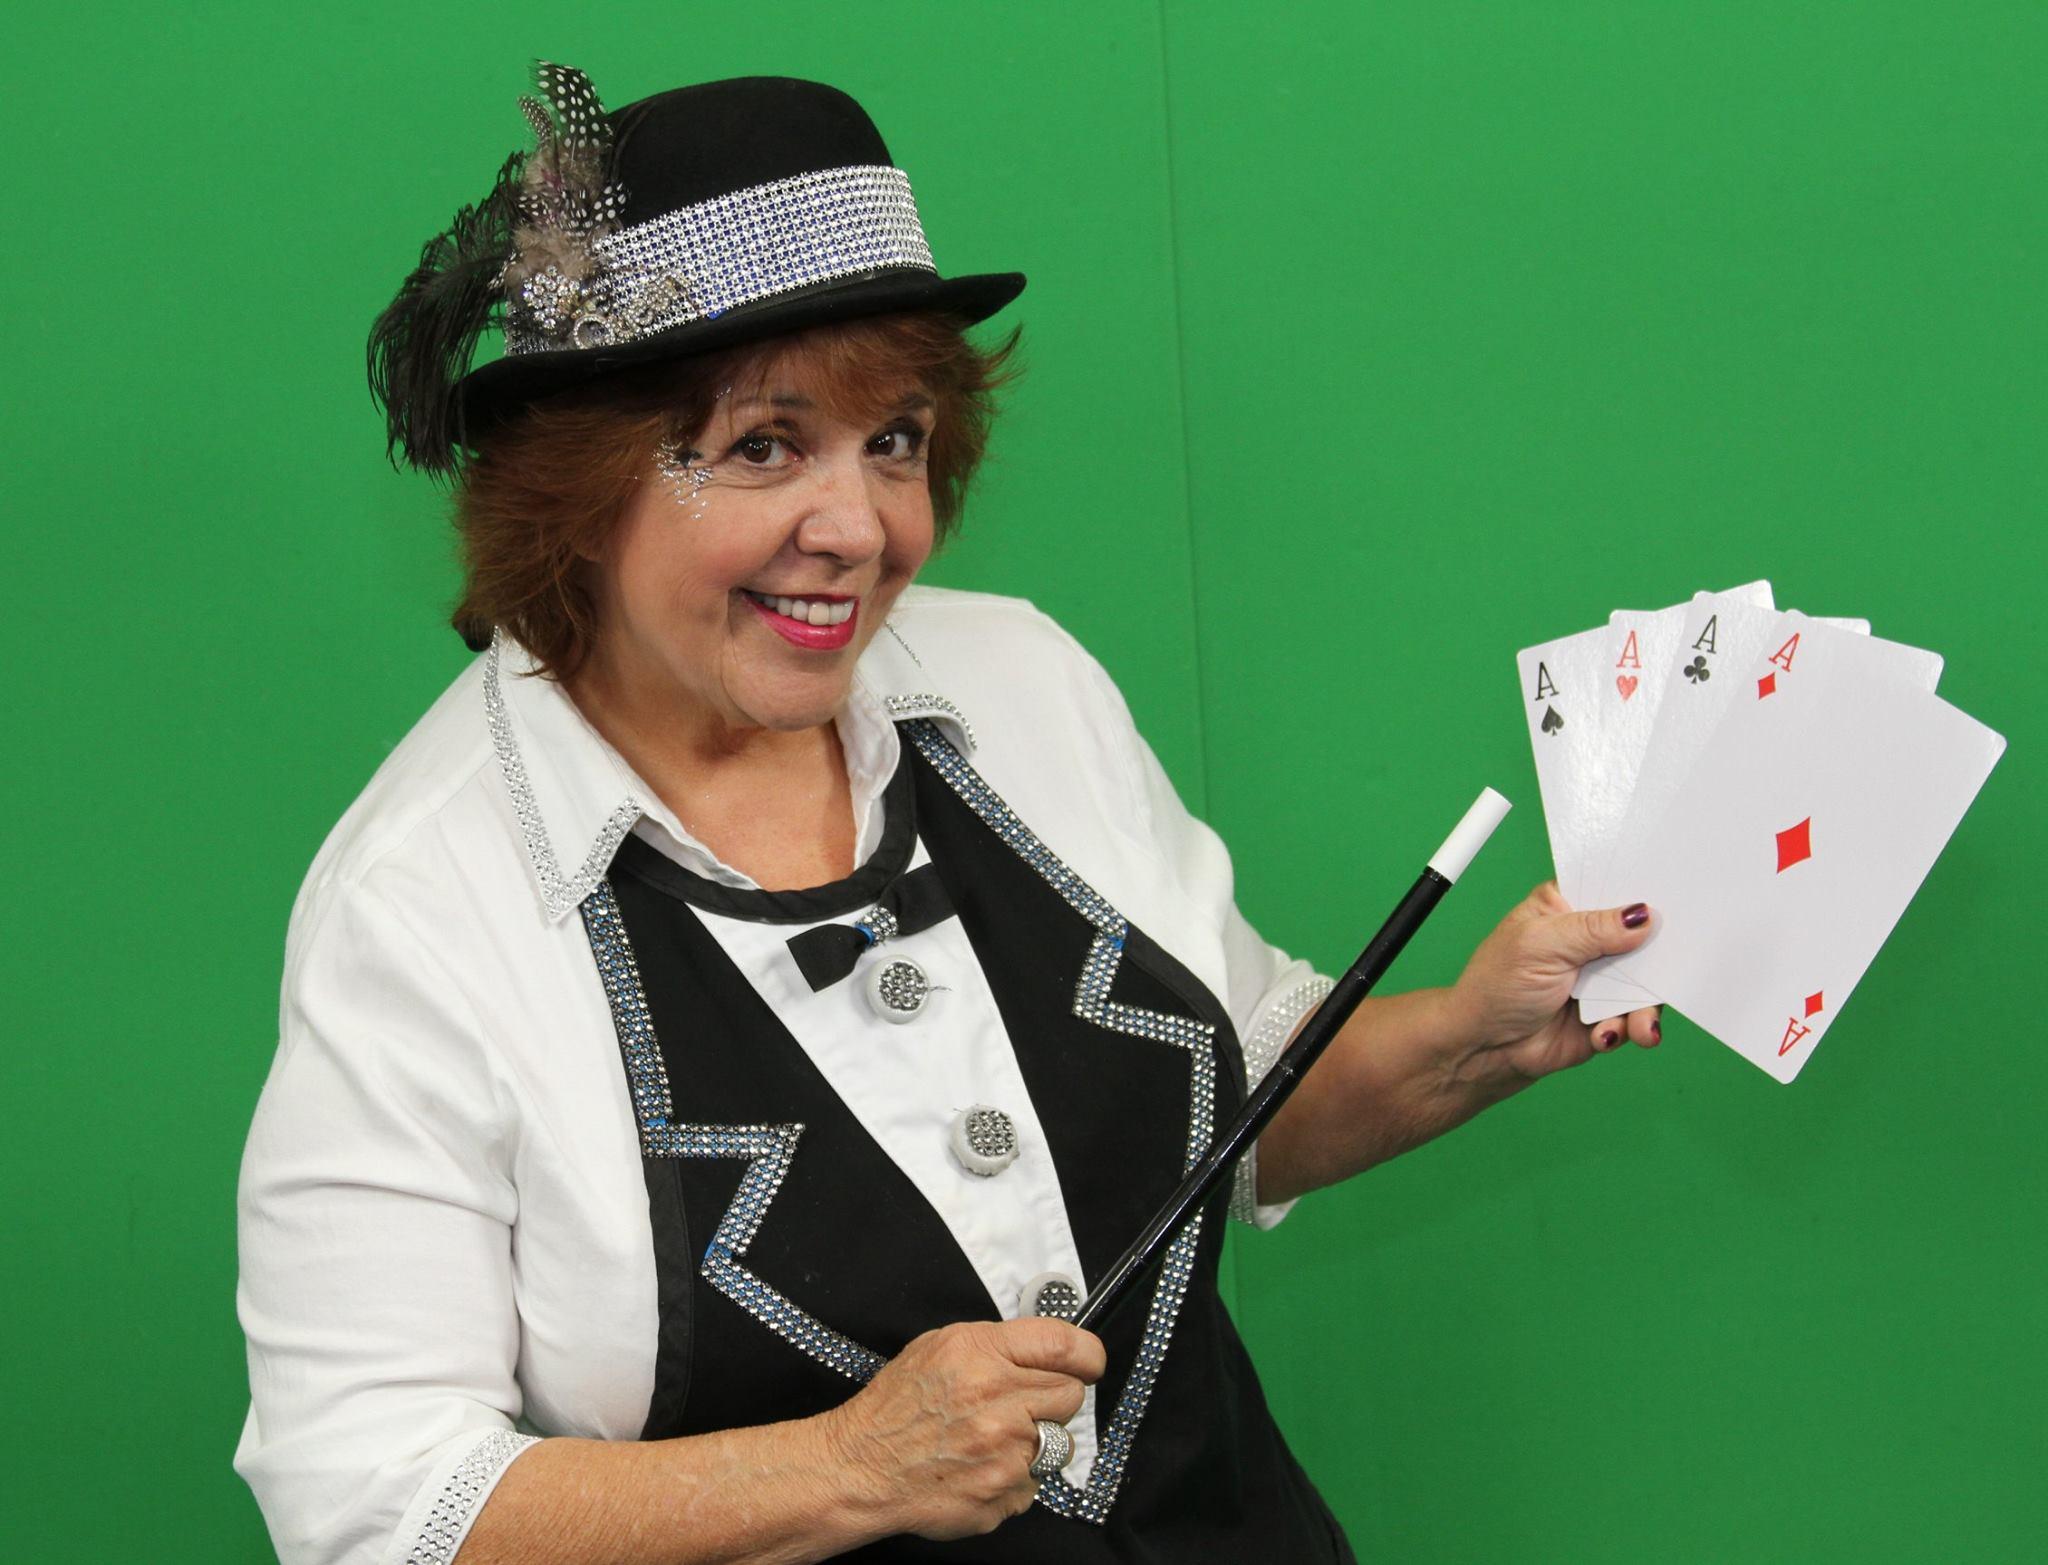 Magician Card Tricks